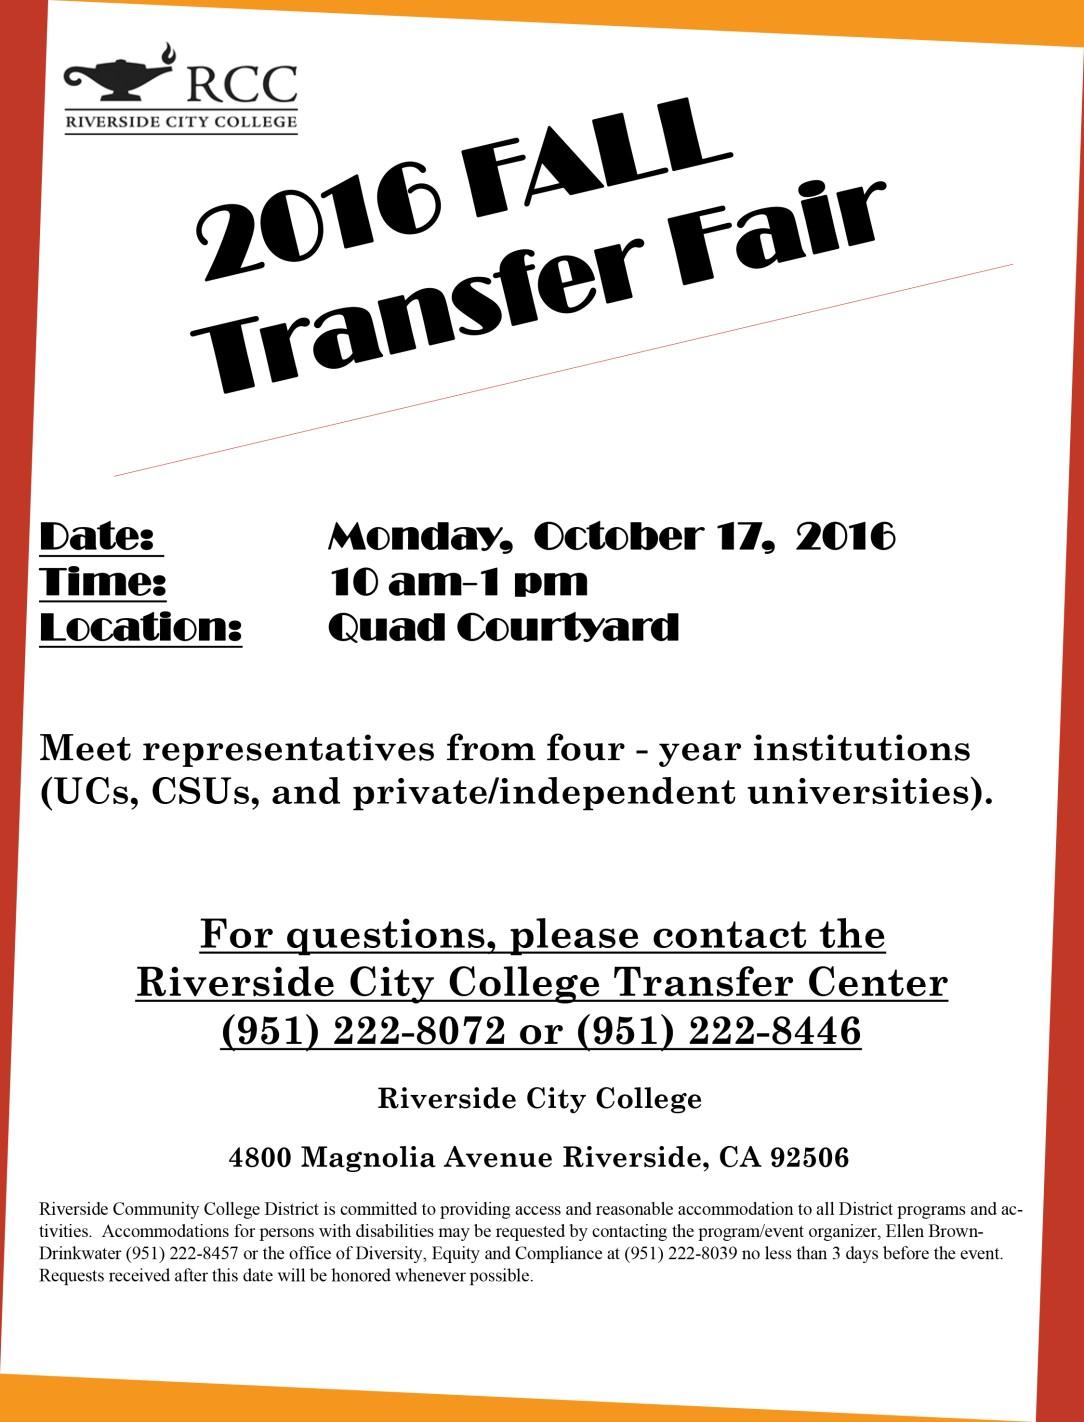 2016-fall-transfer-fair-flyer-rs